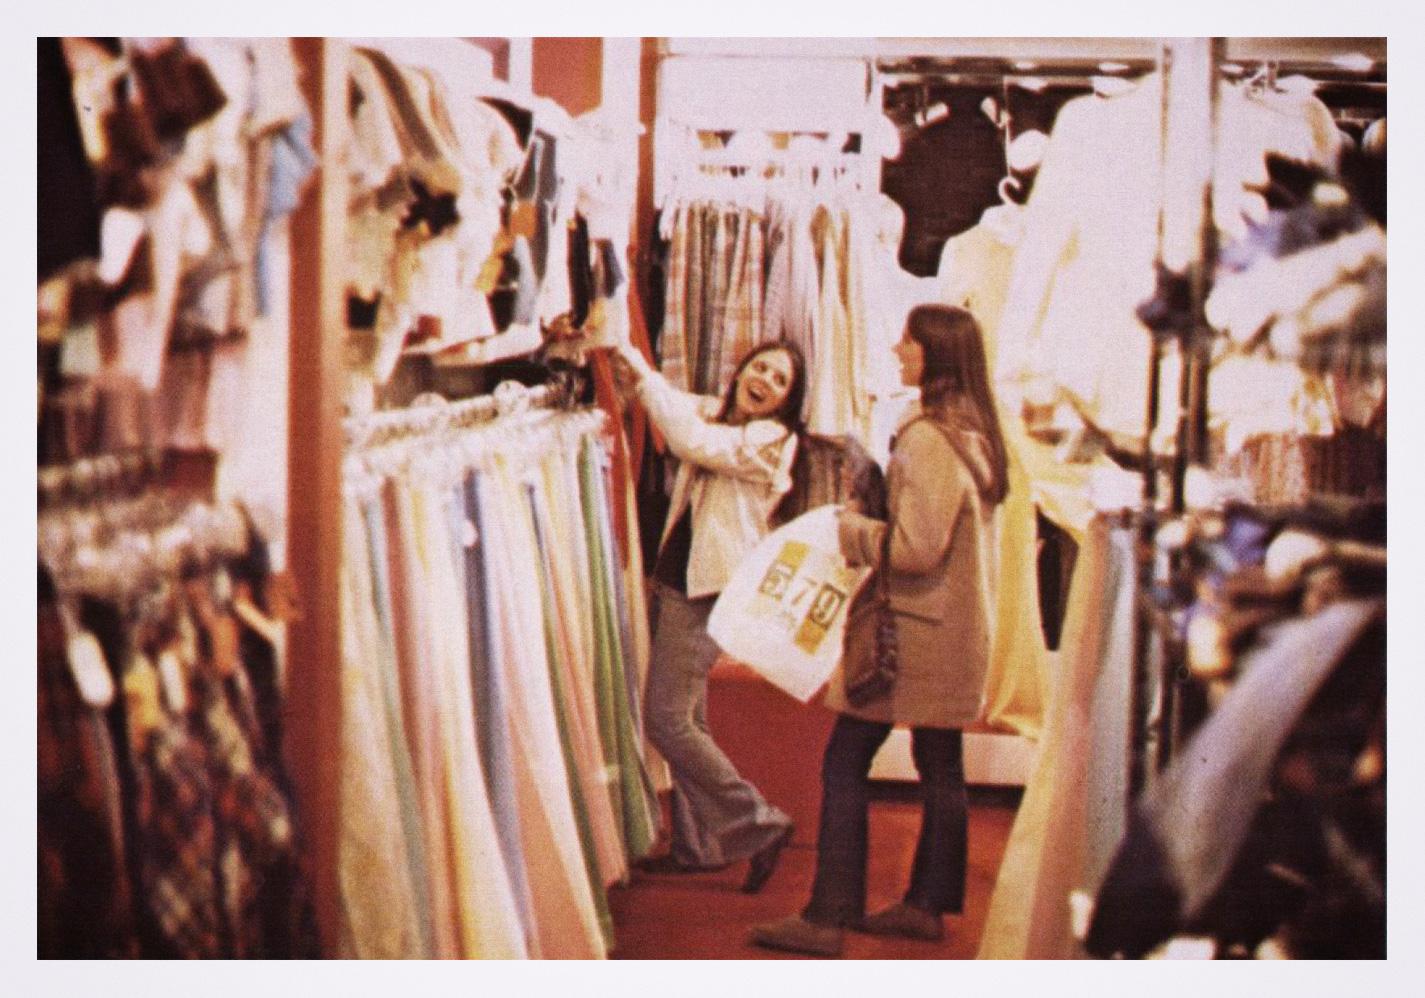 shopping at 579 store